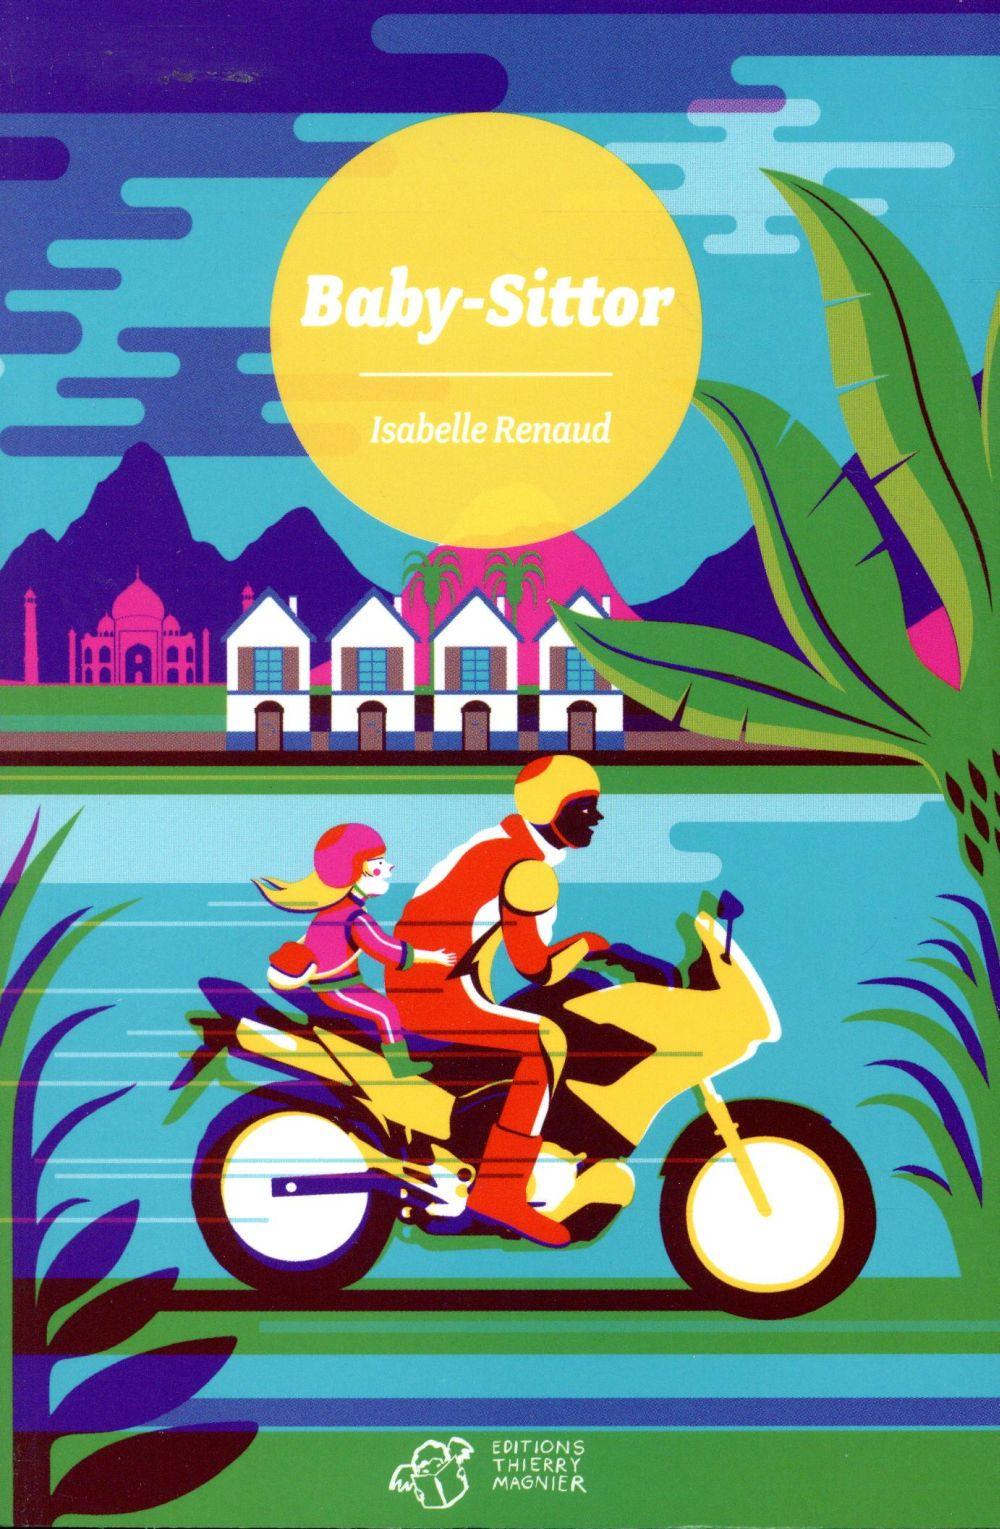 BABY-SITTOR